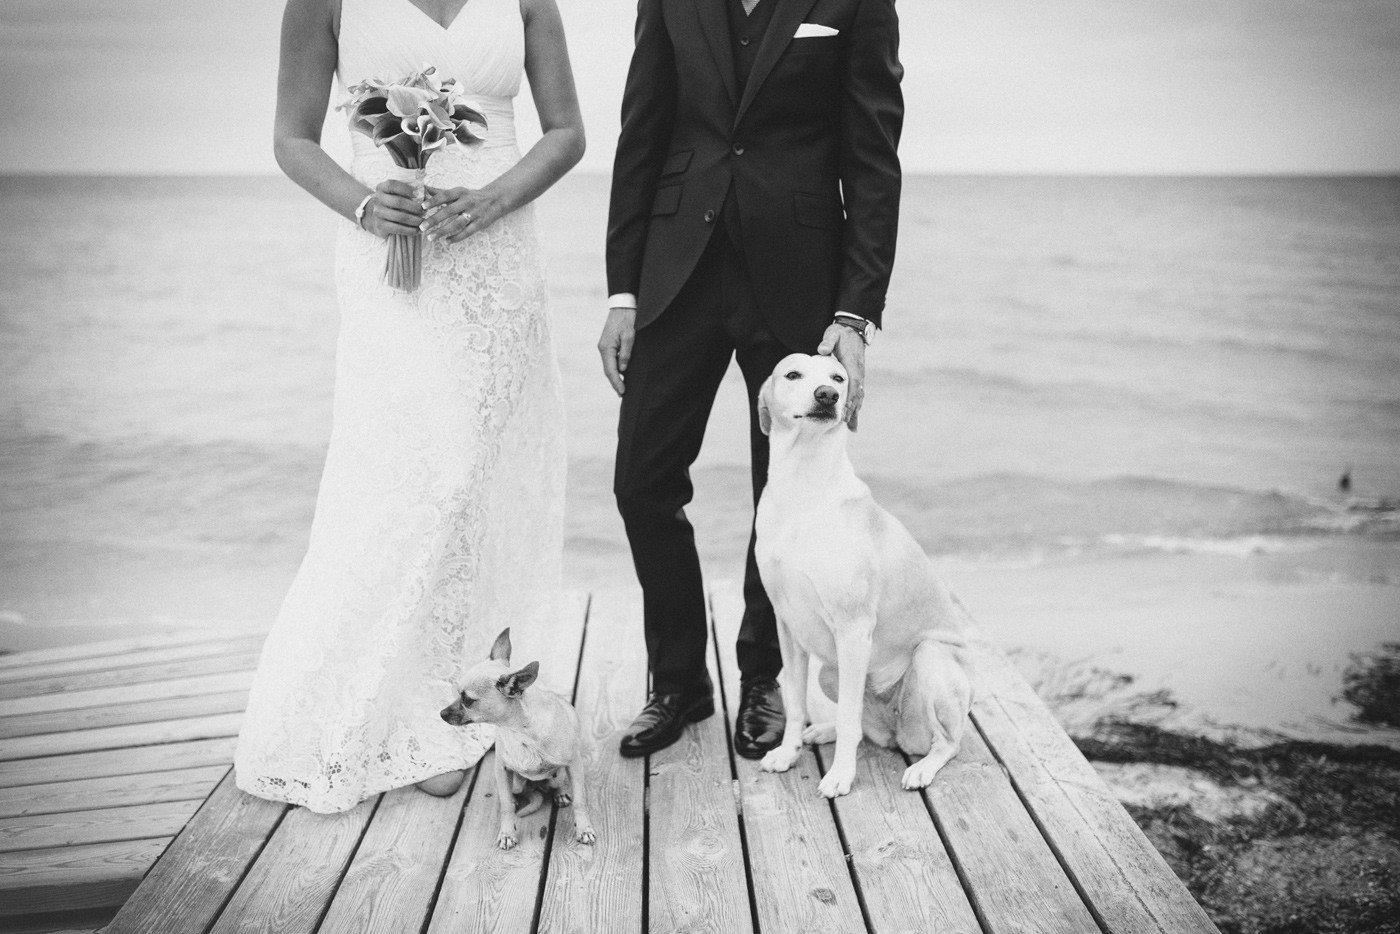 Bröllop brygga kärlek